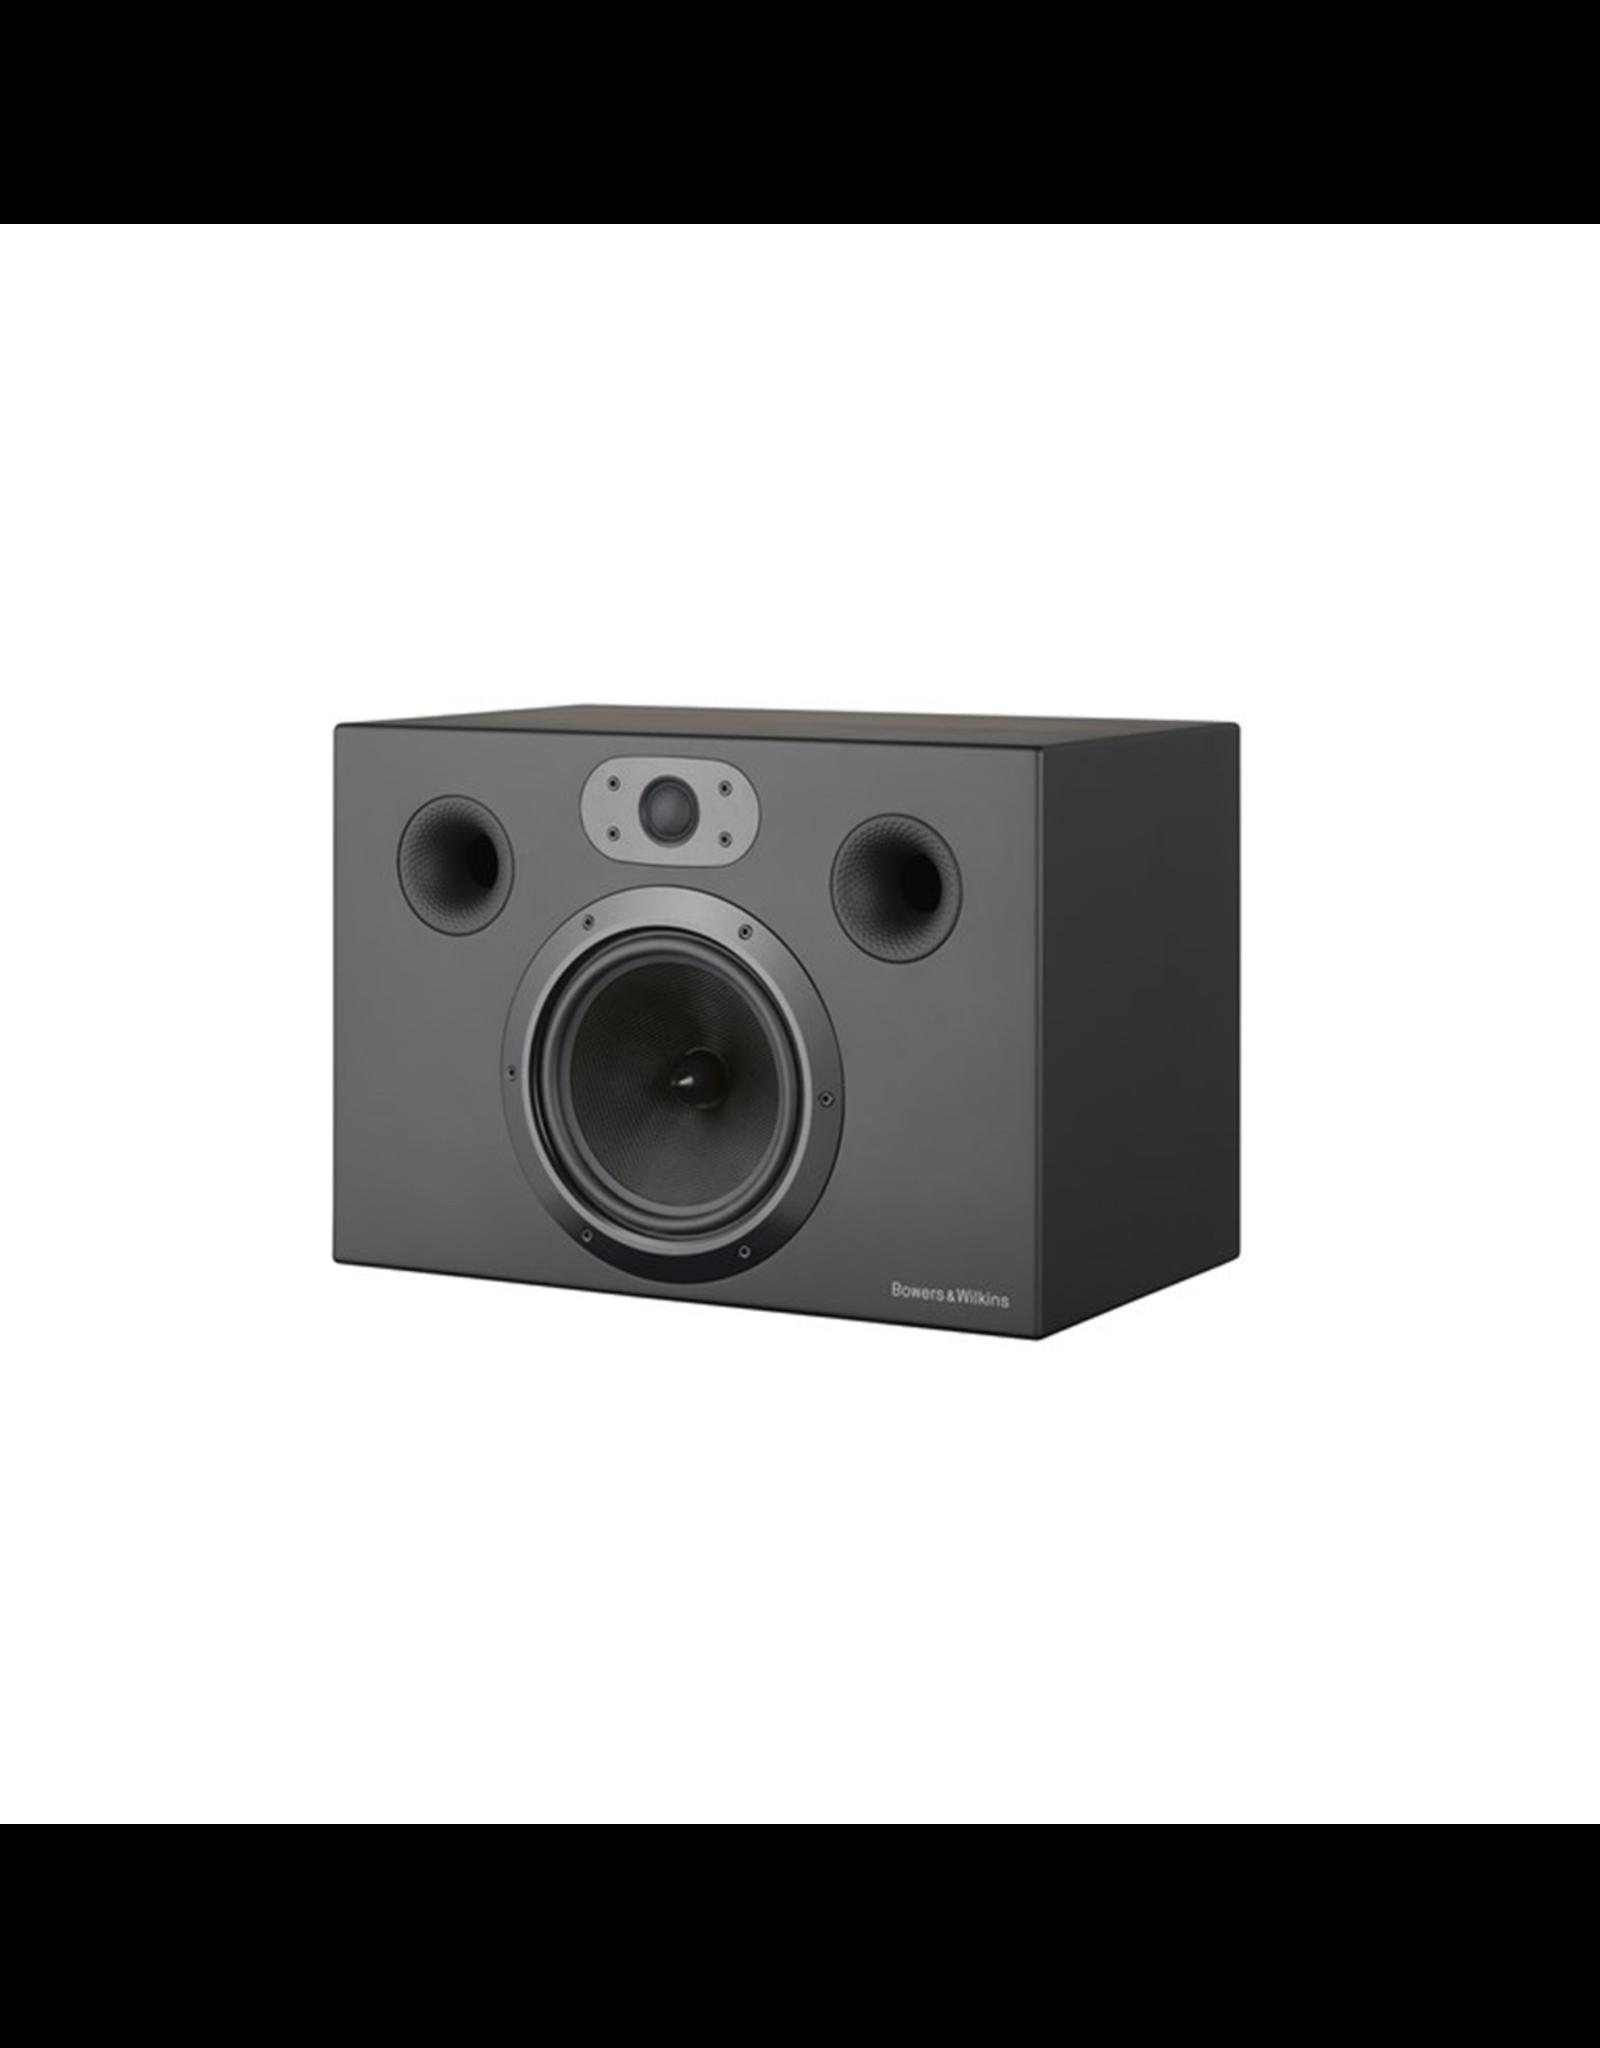 BOWERS & WILKINS B&W CT7.5 Custom Theatre speaker (single) BLACK